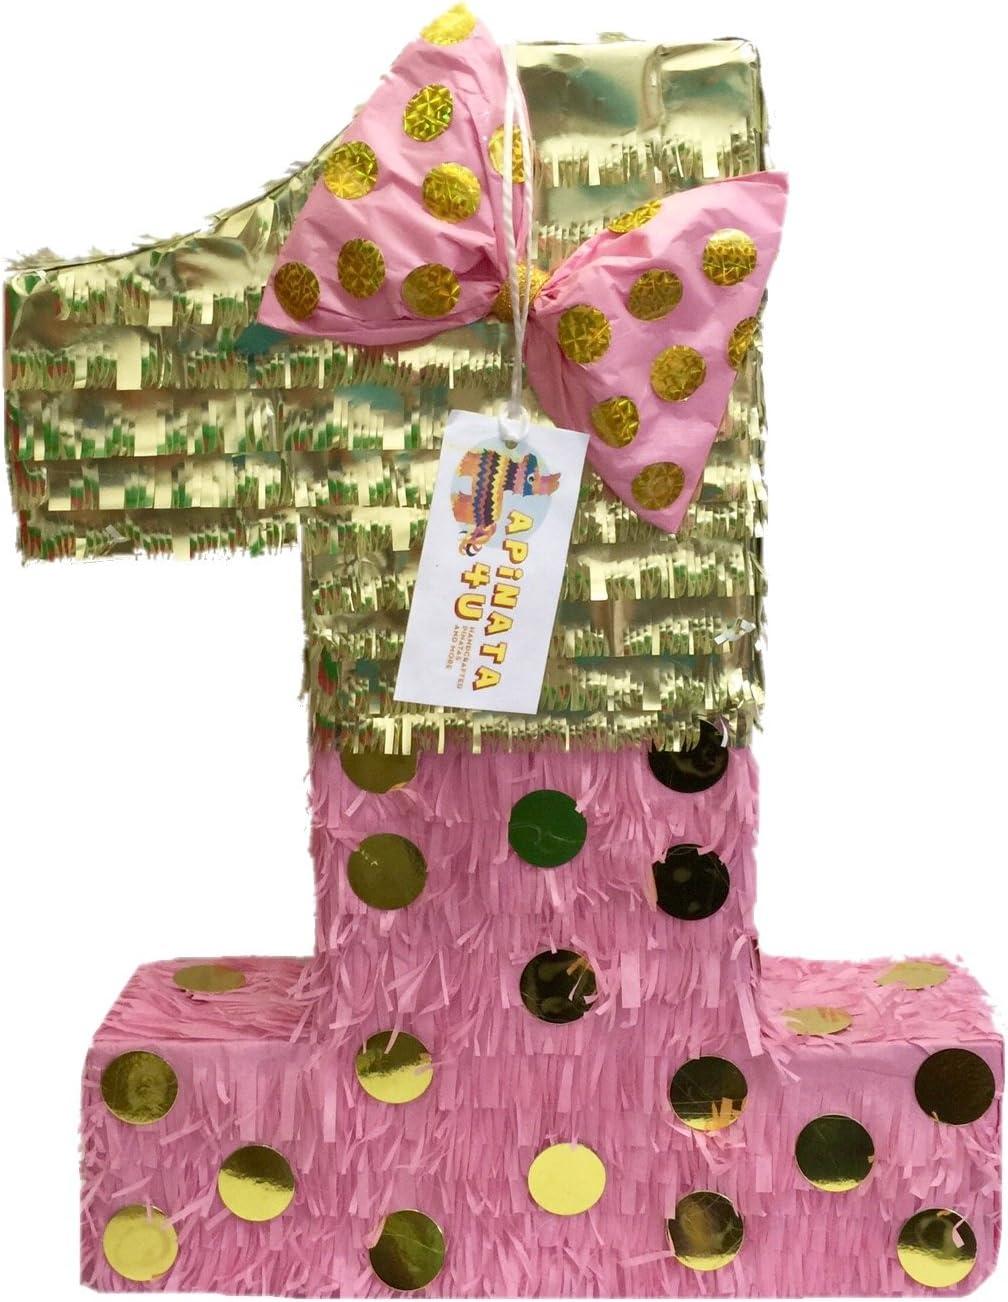 APINATA4U Large 4 years warranty Atlanta Mall Pink Gold with Bow 23